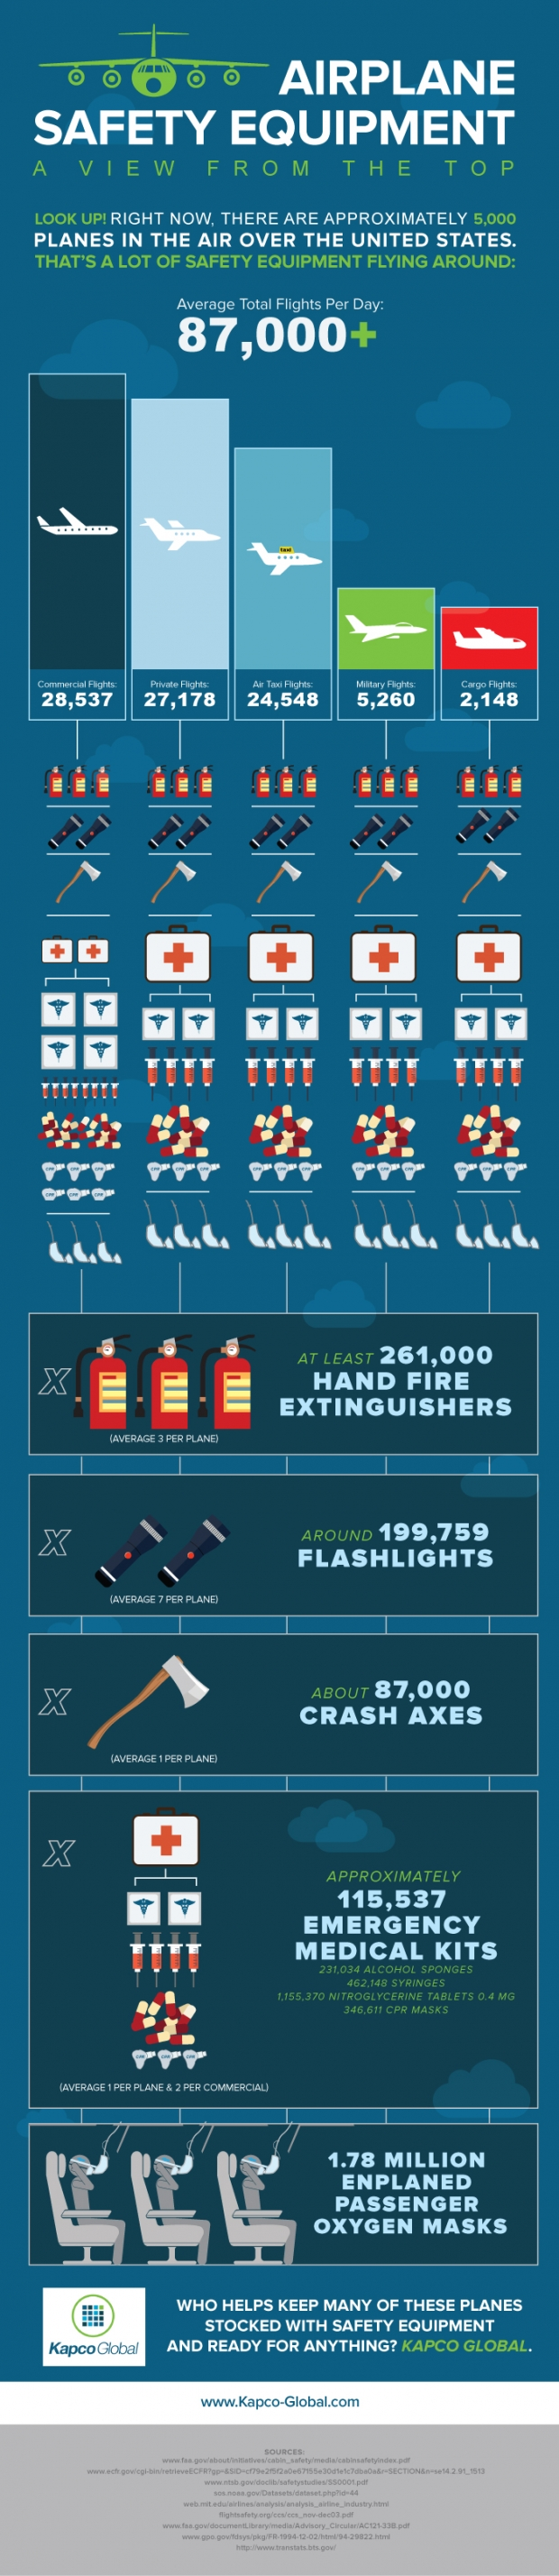 KG_4732_Infographic_PRESS